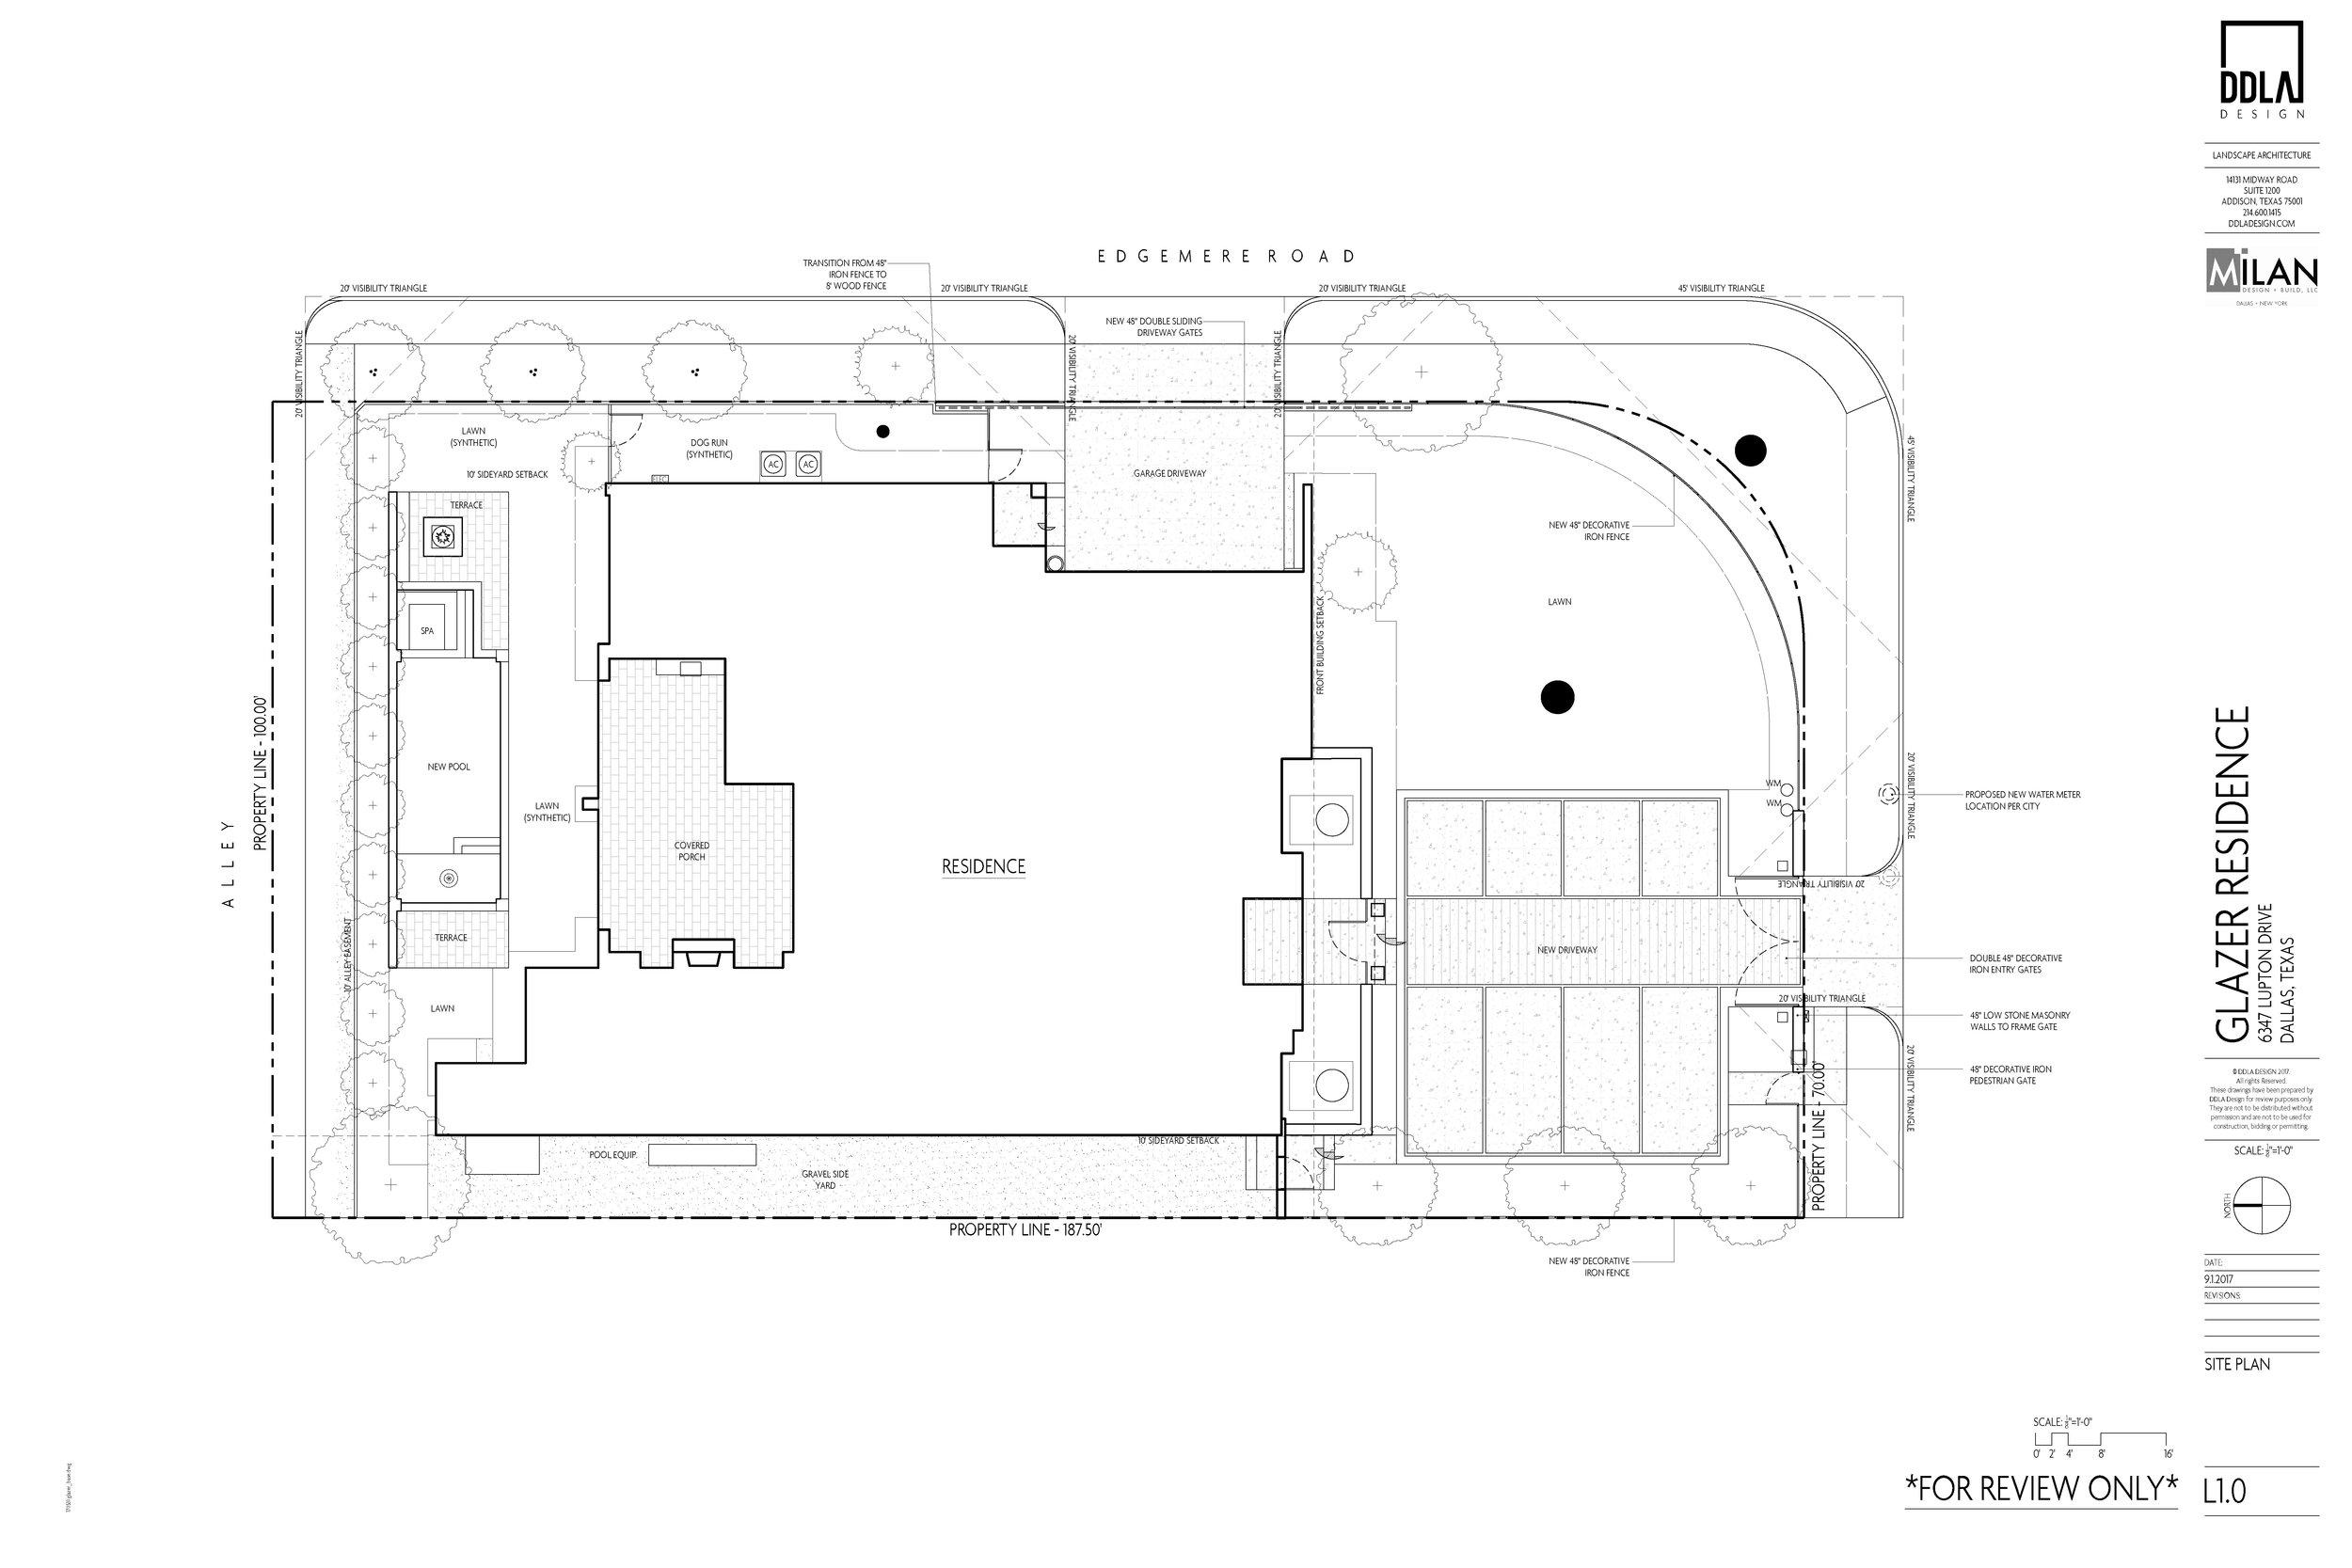 170901 glazer_cd drawing set_Page_2.jpg